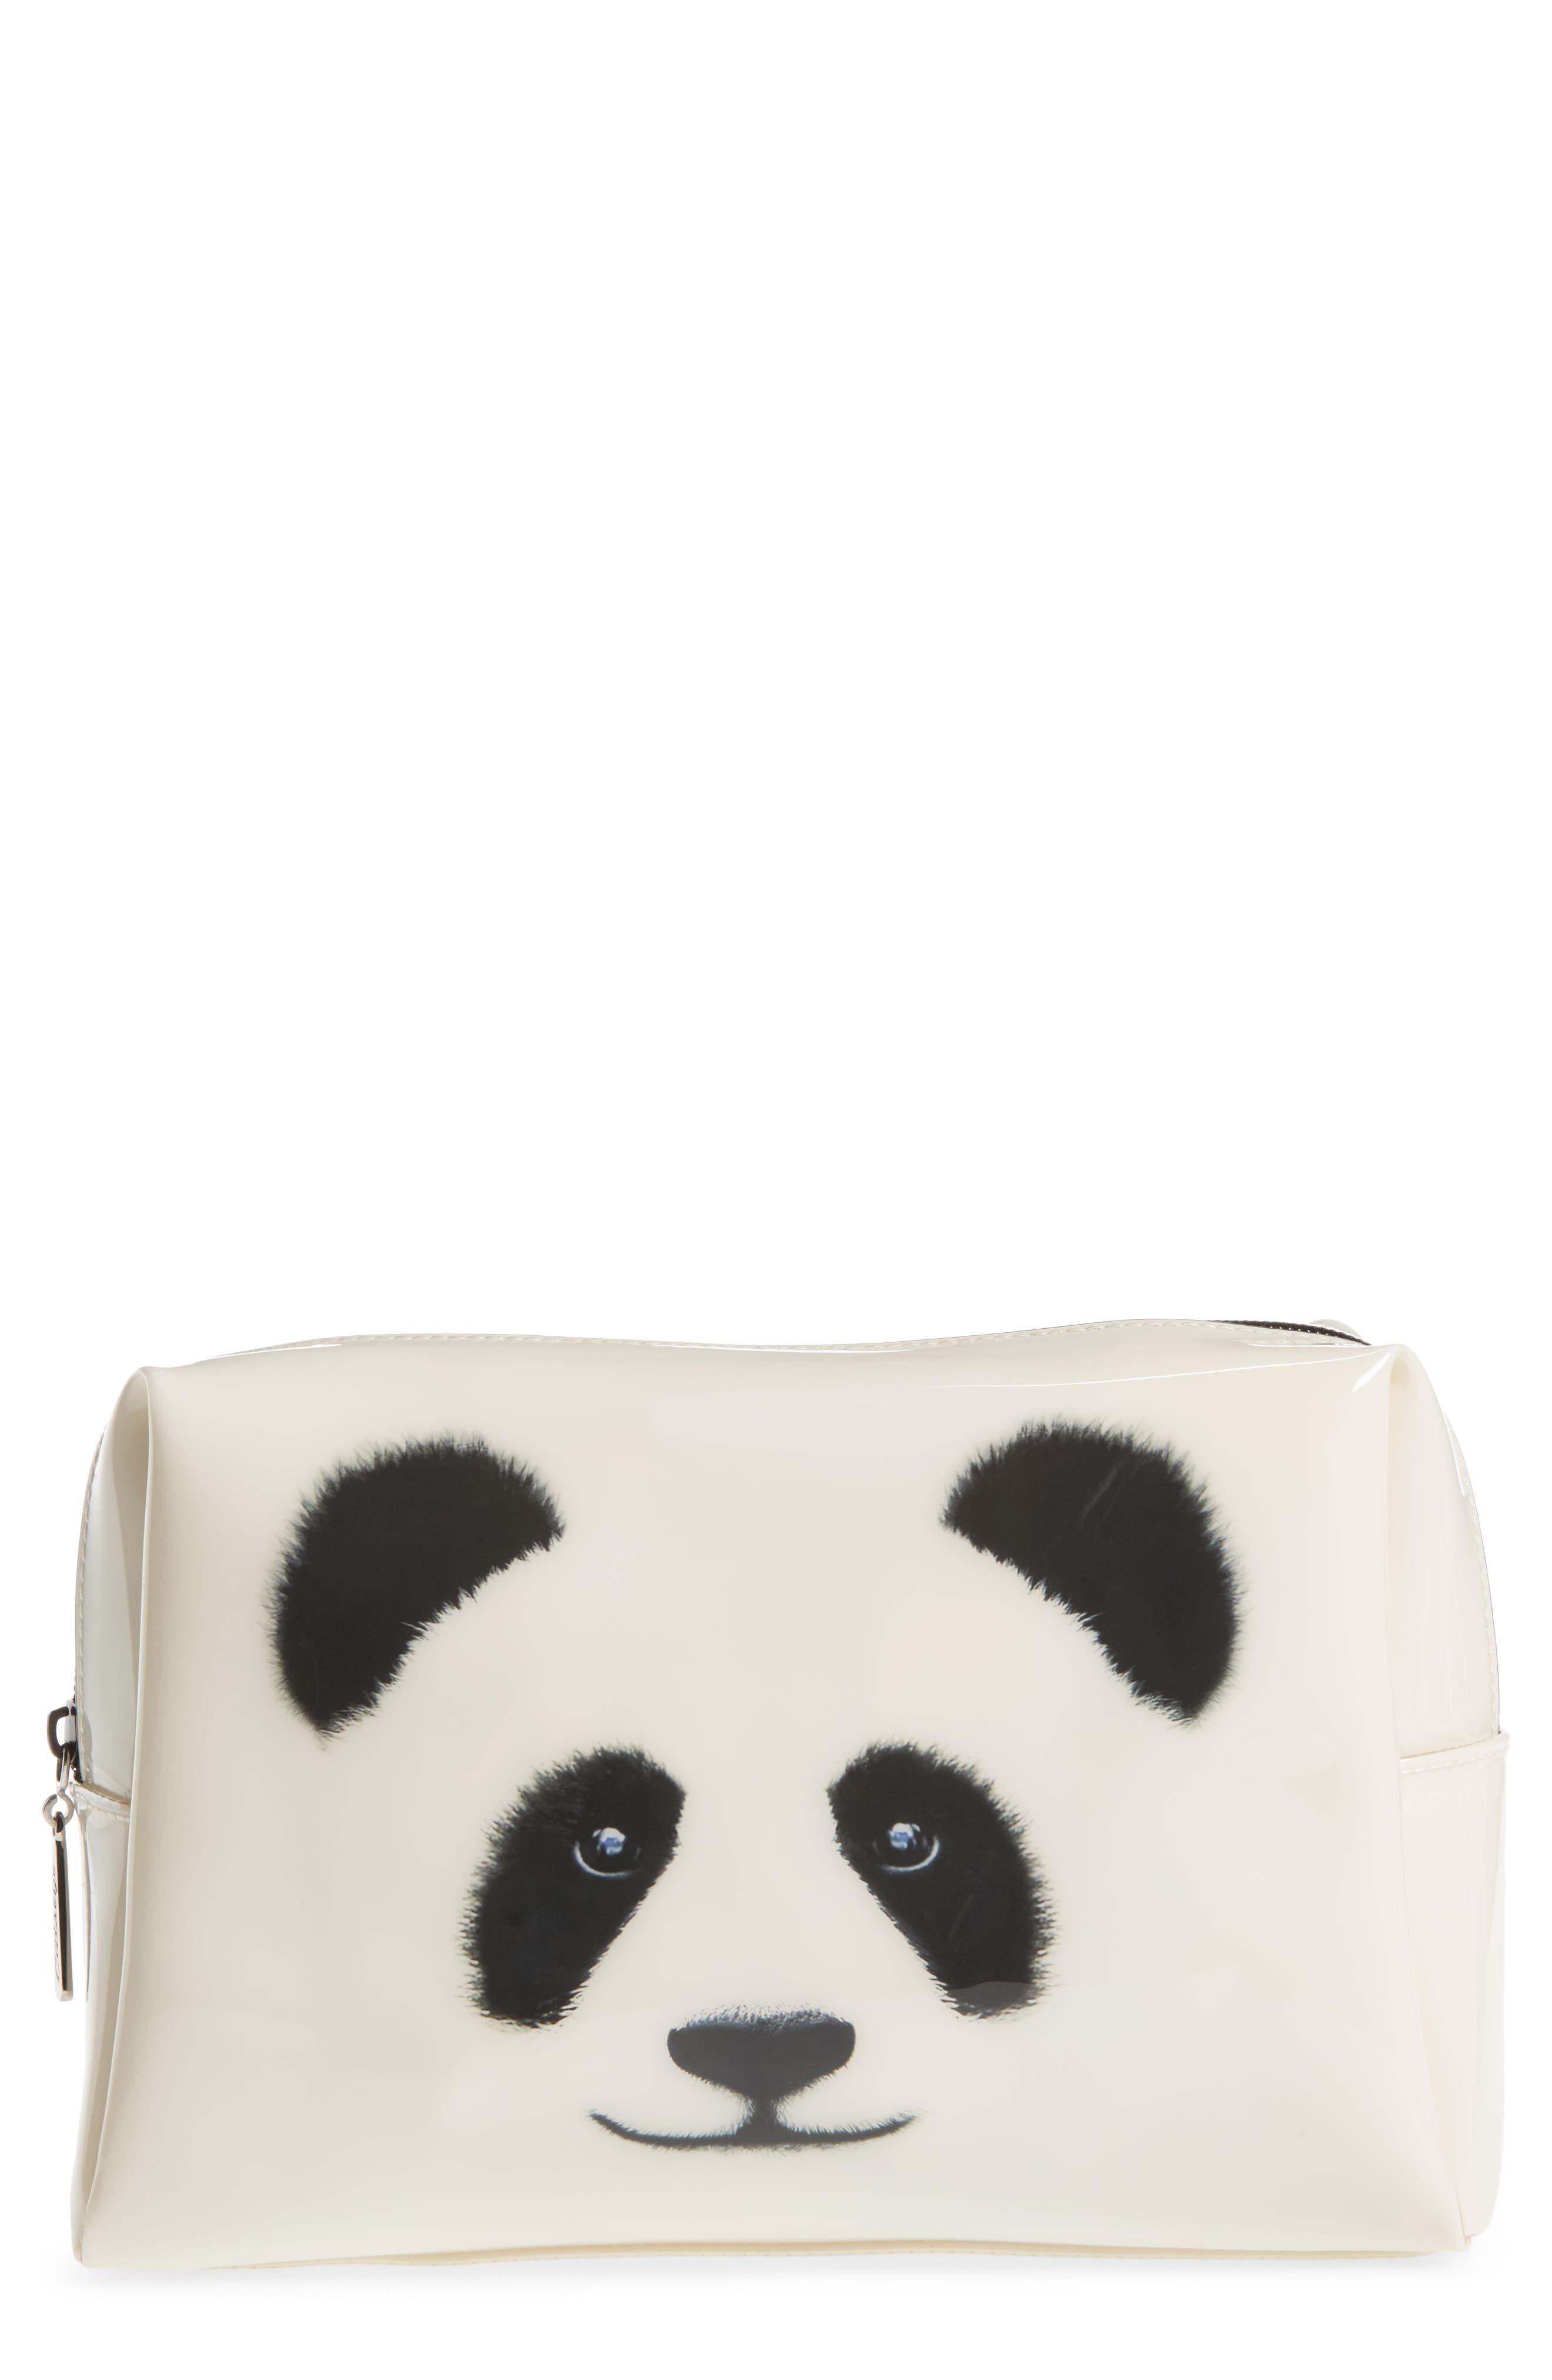 Big Face Panda Large Cosmetics Bag,                             Main thumbnail 1, color,                             100